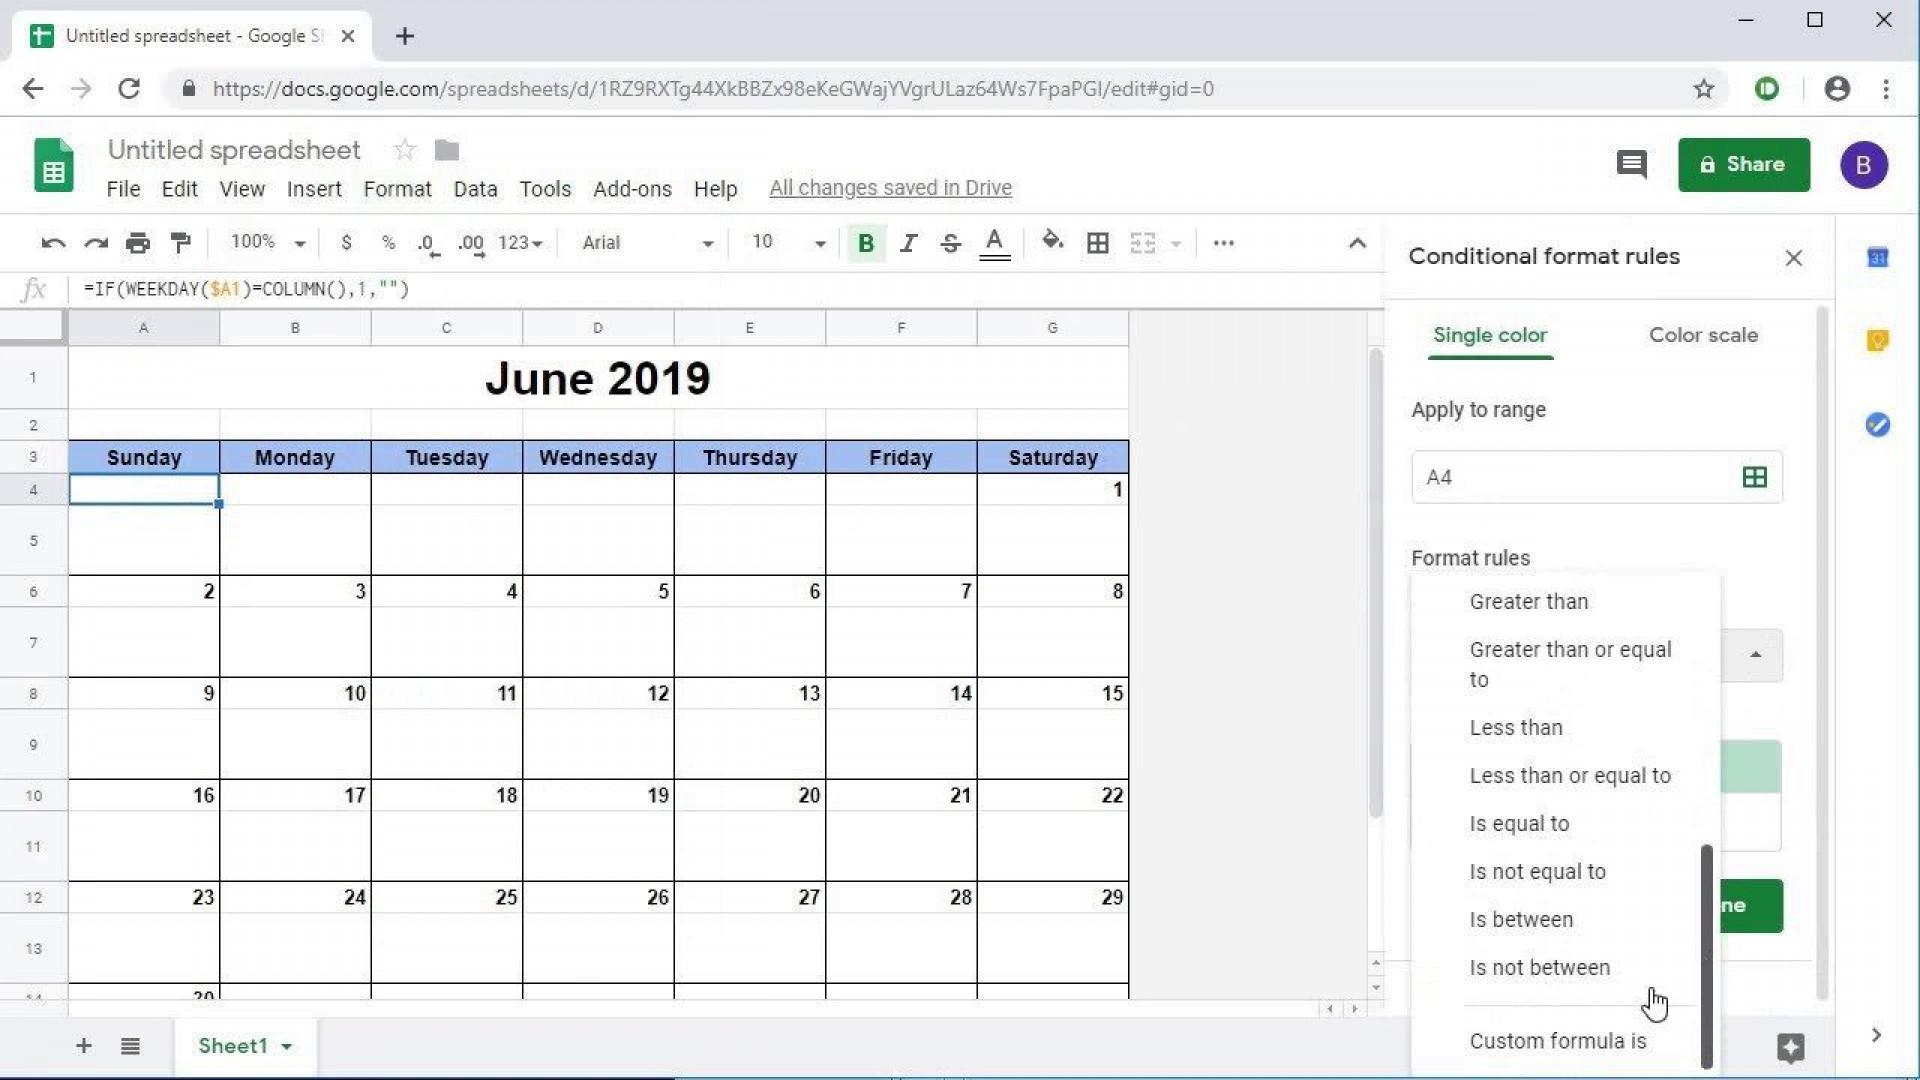 006 Frightening Google Doc Employee Schedule Template Picture  Weekly Work1920